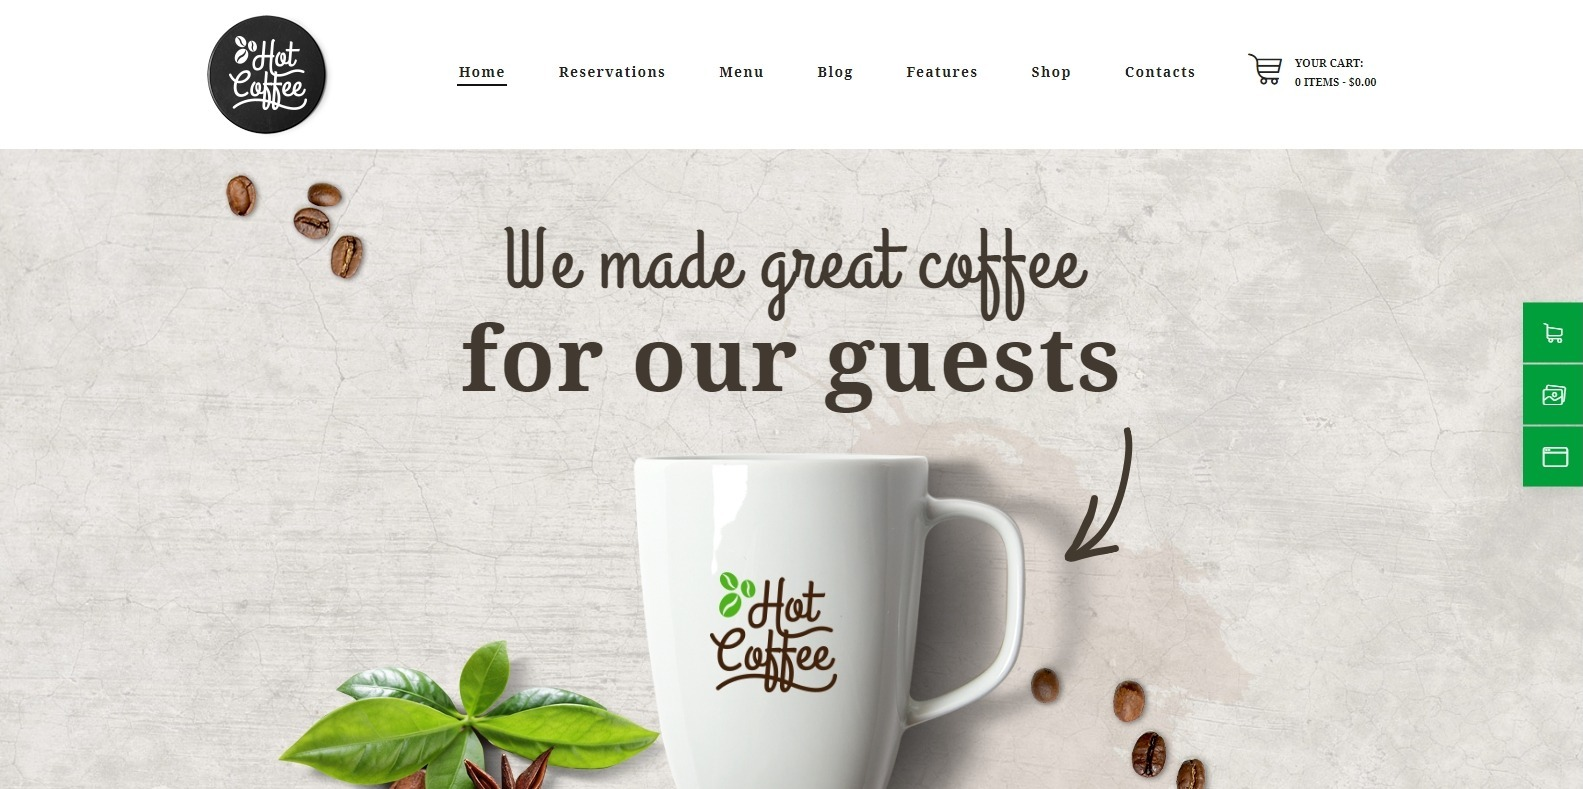 hot-coffee-coffee-shop-website-template